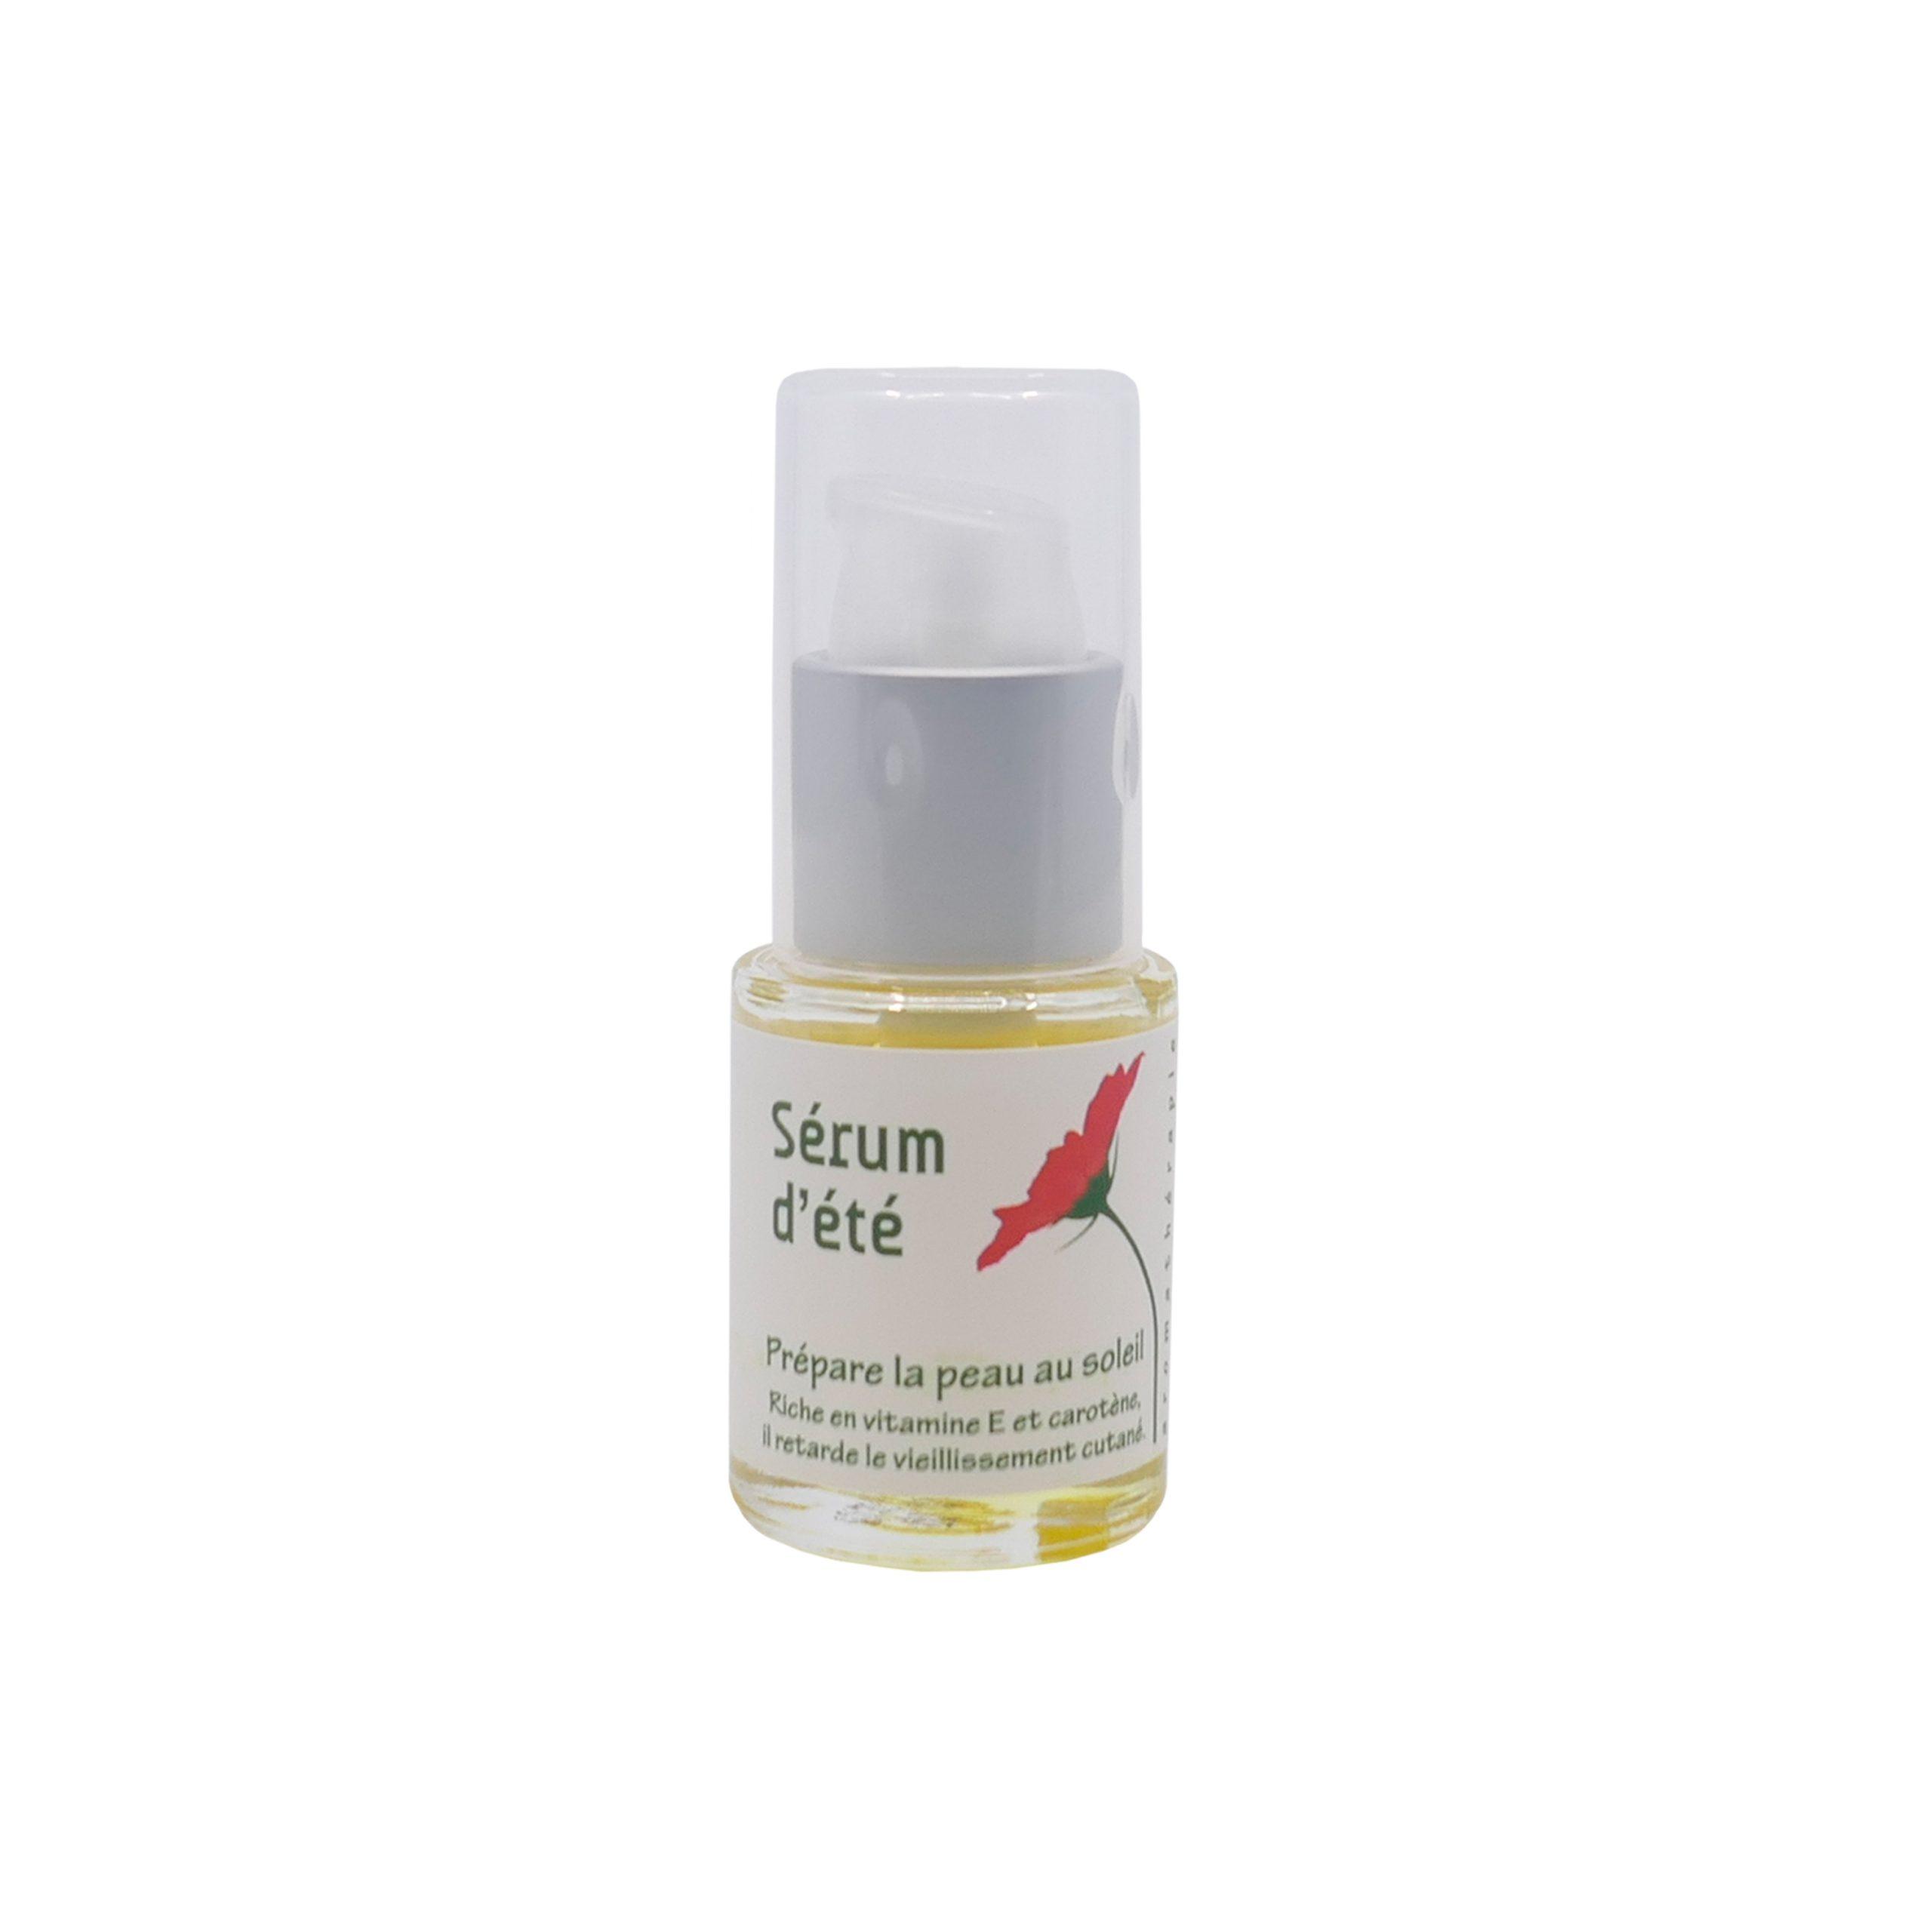 Serum - antioxidant Image